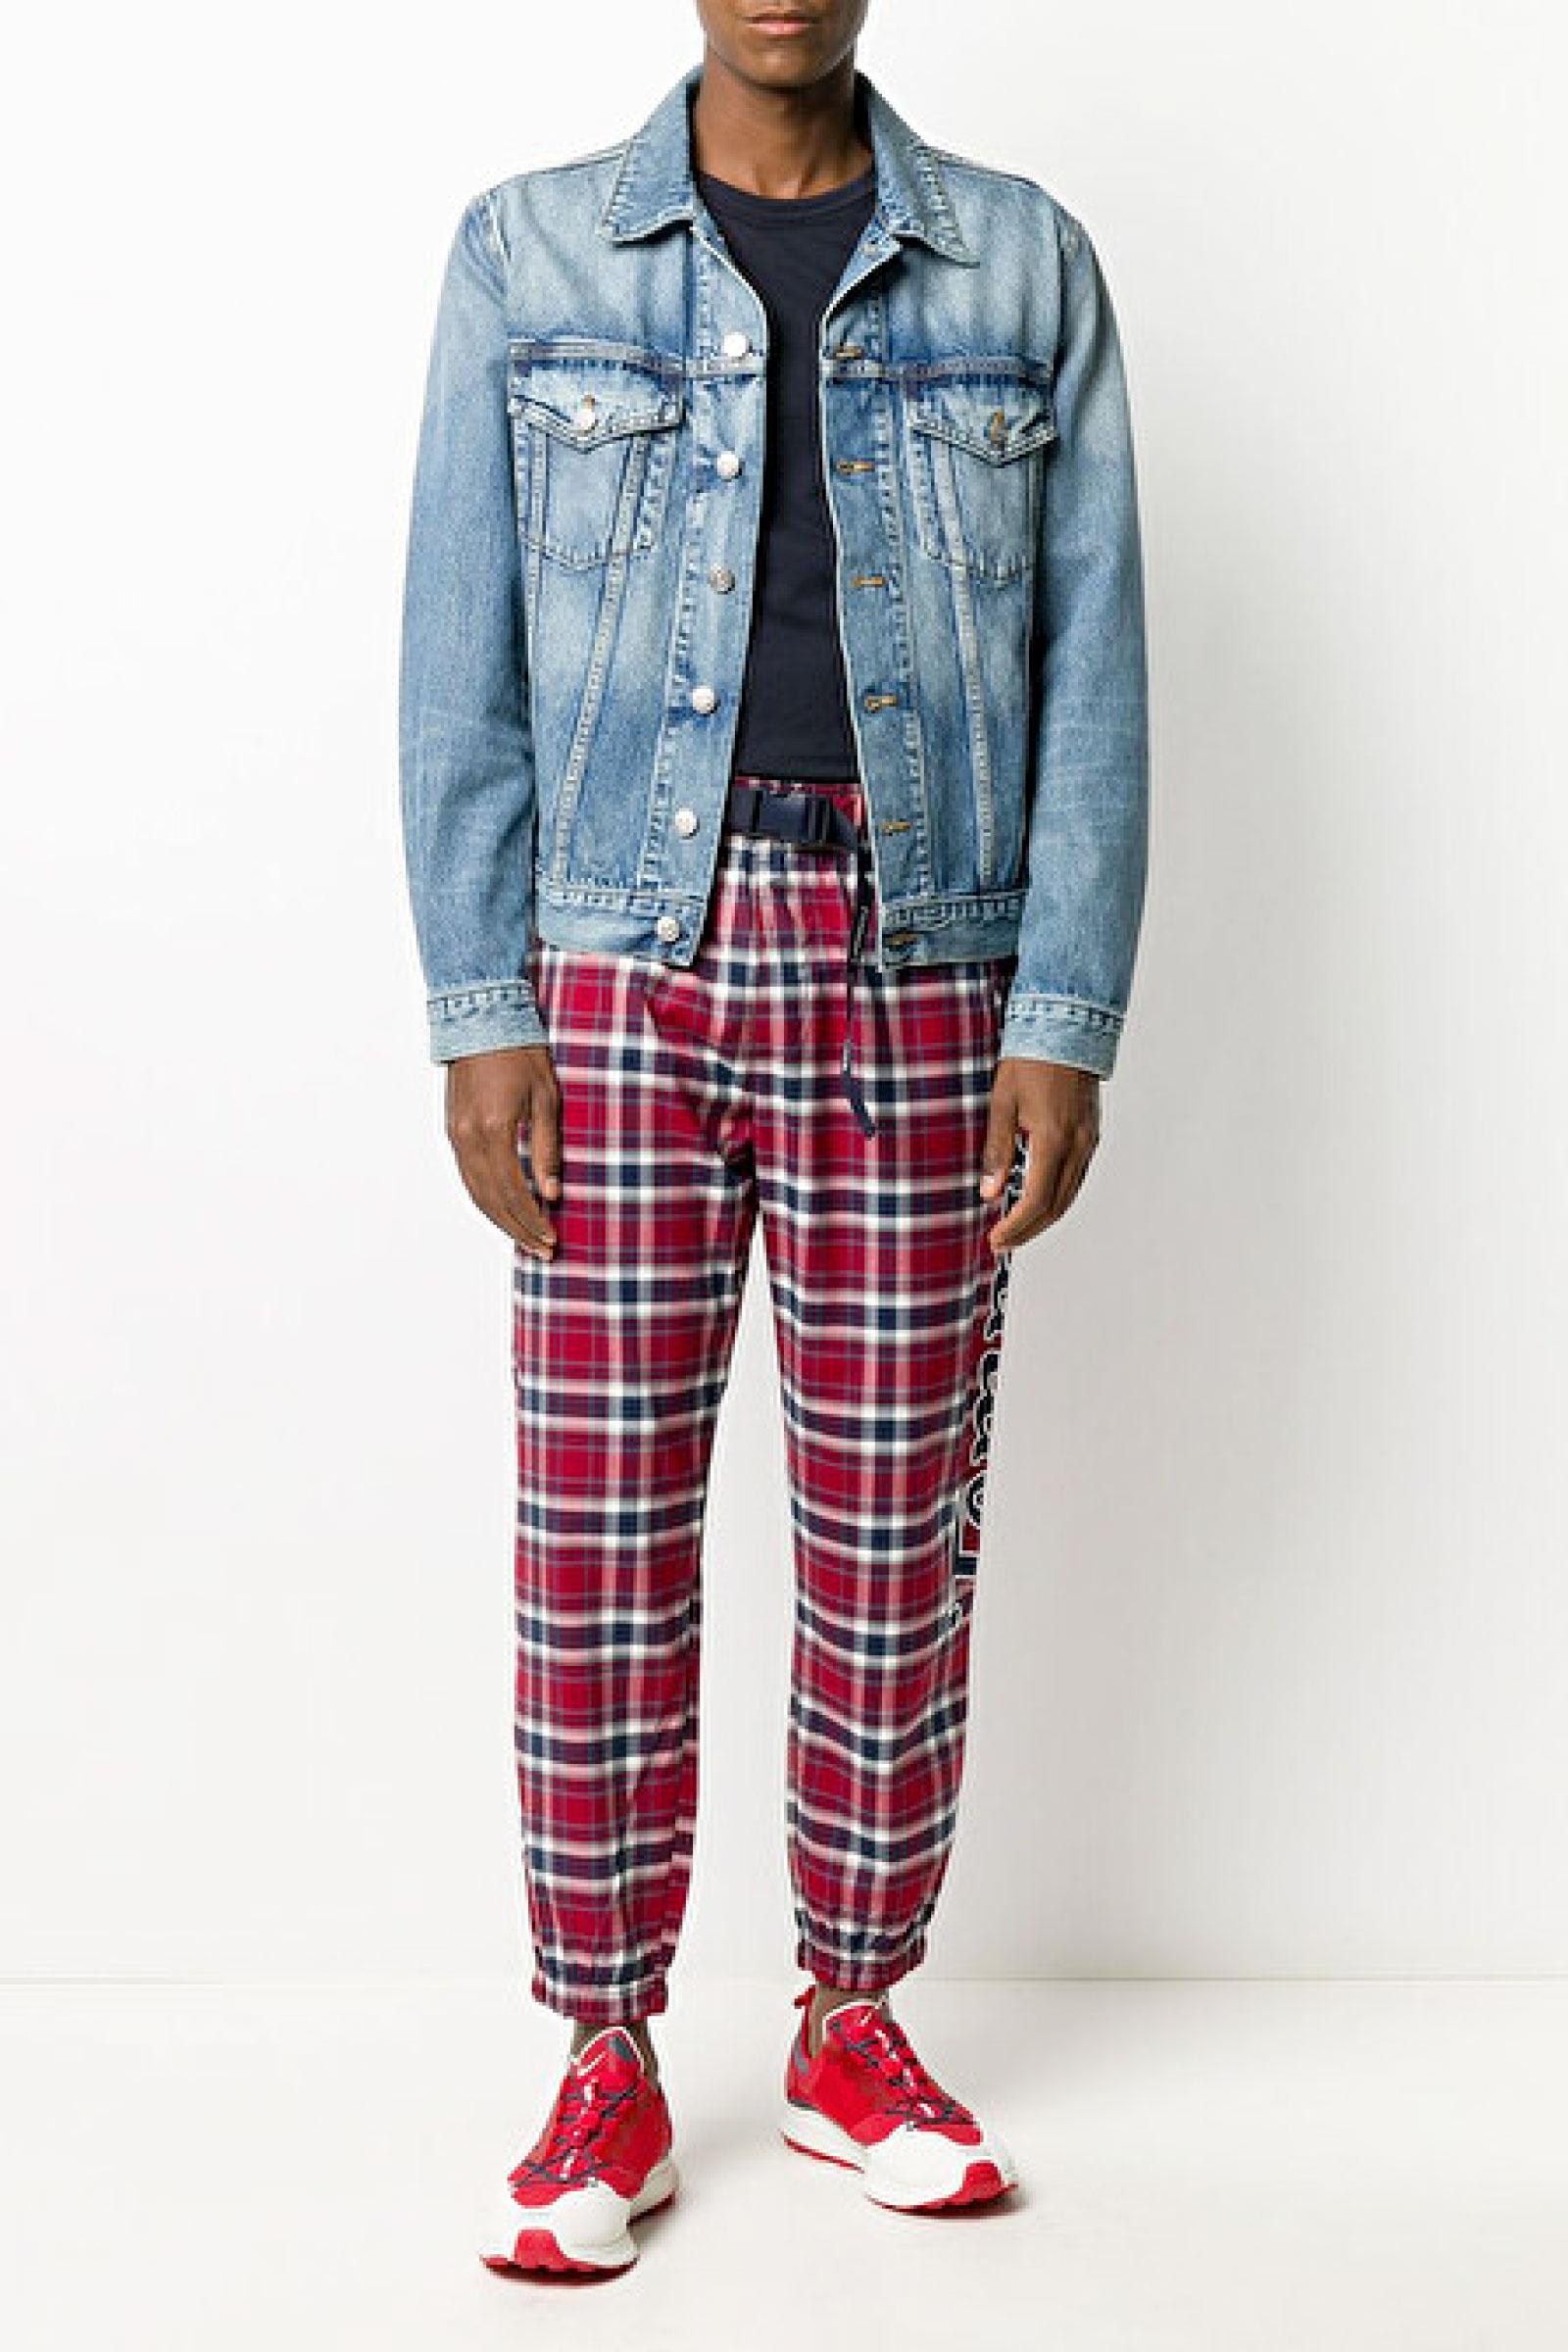 TOMMY JEANS Men's trousers TOMMY JEANS | Trousers | DM0DM08370XLK